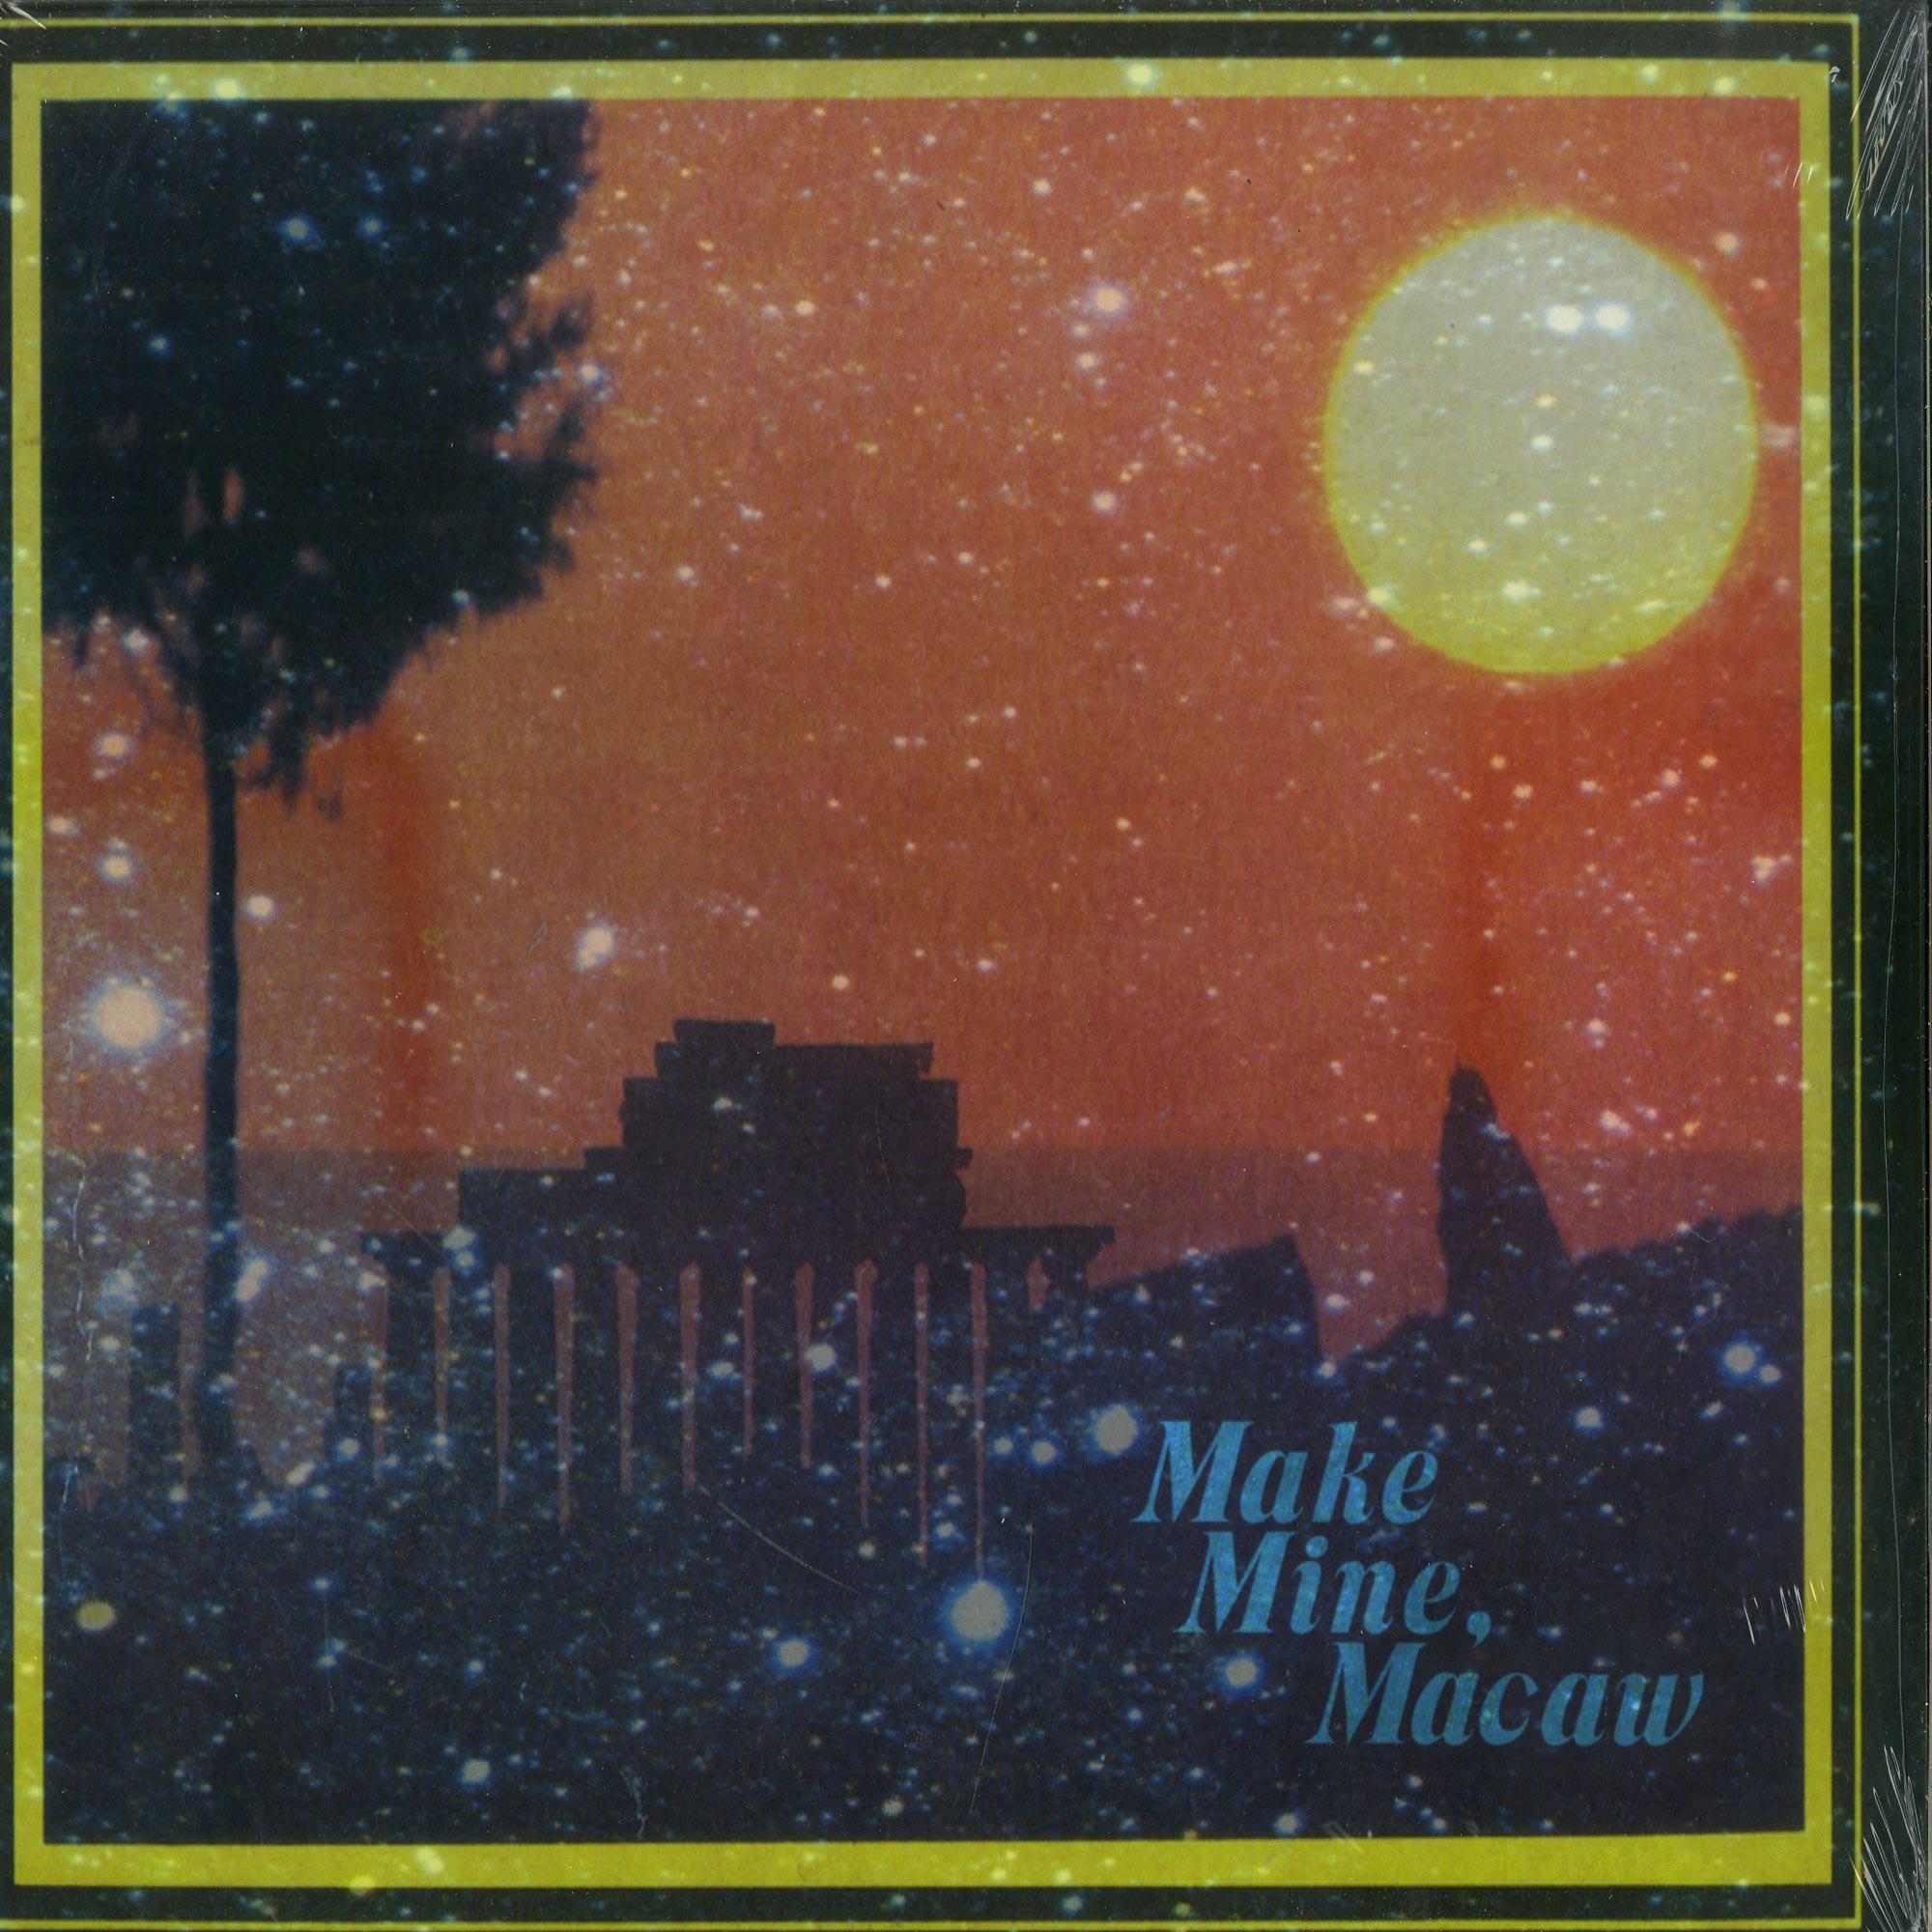 Monopoly Child Star Searchers - MAKE MINE MACAW